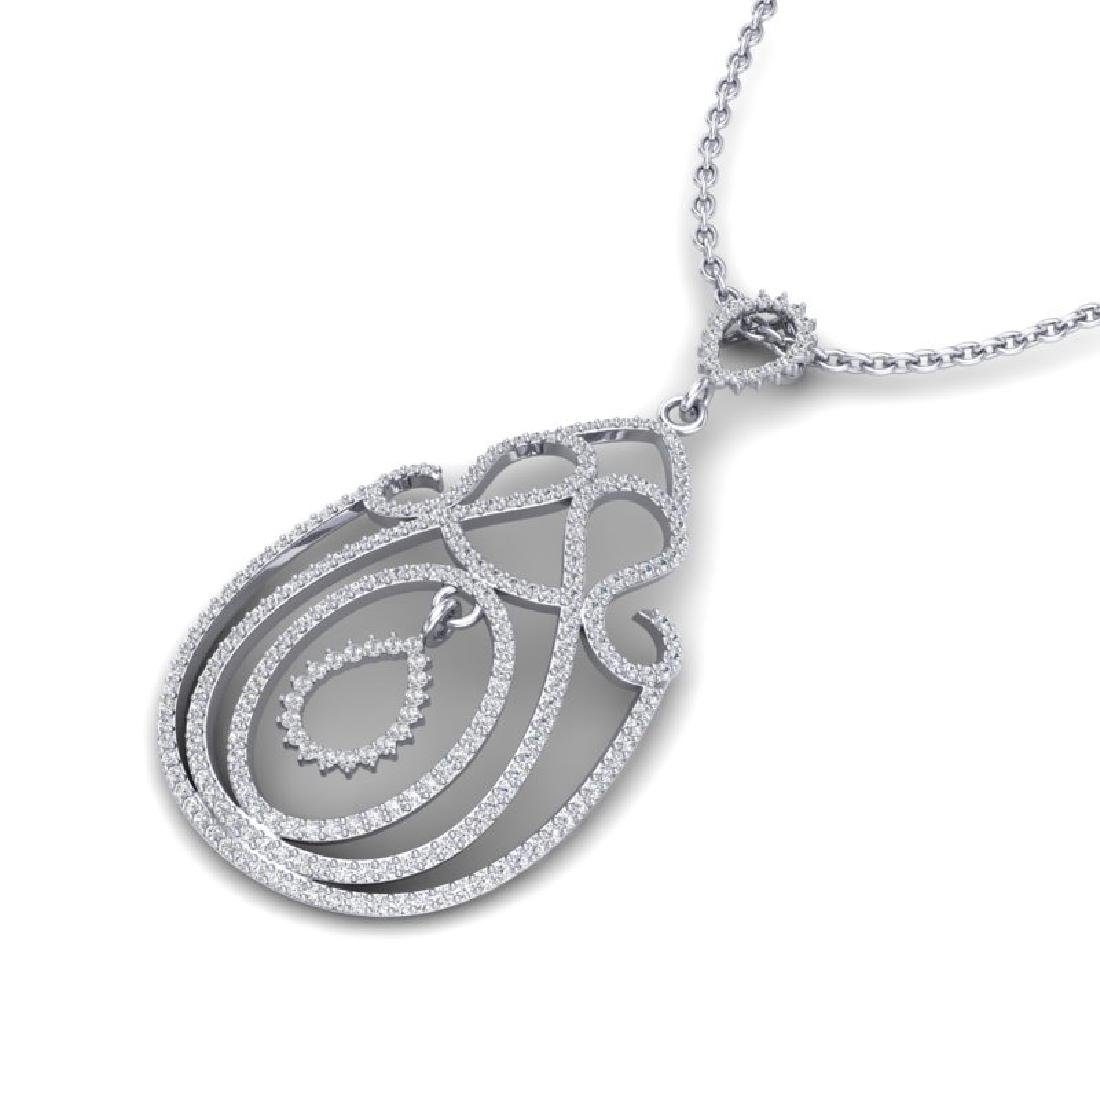 2 CTW Micro Pave Designer VS/SI Diamond Necklace 14K